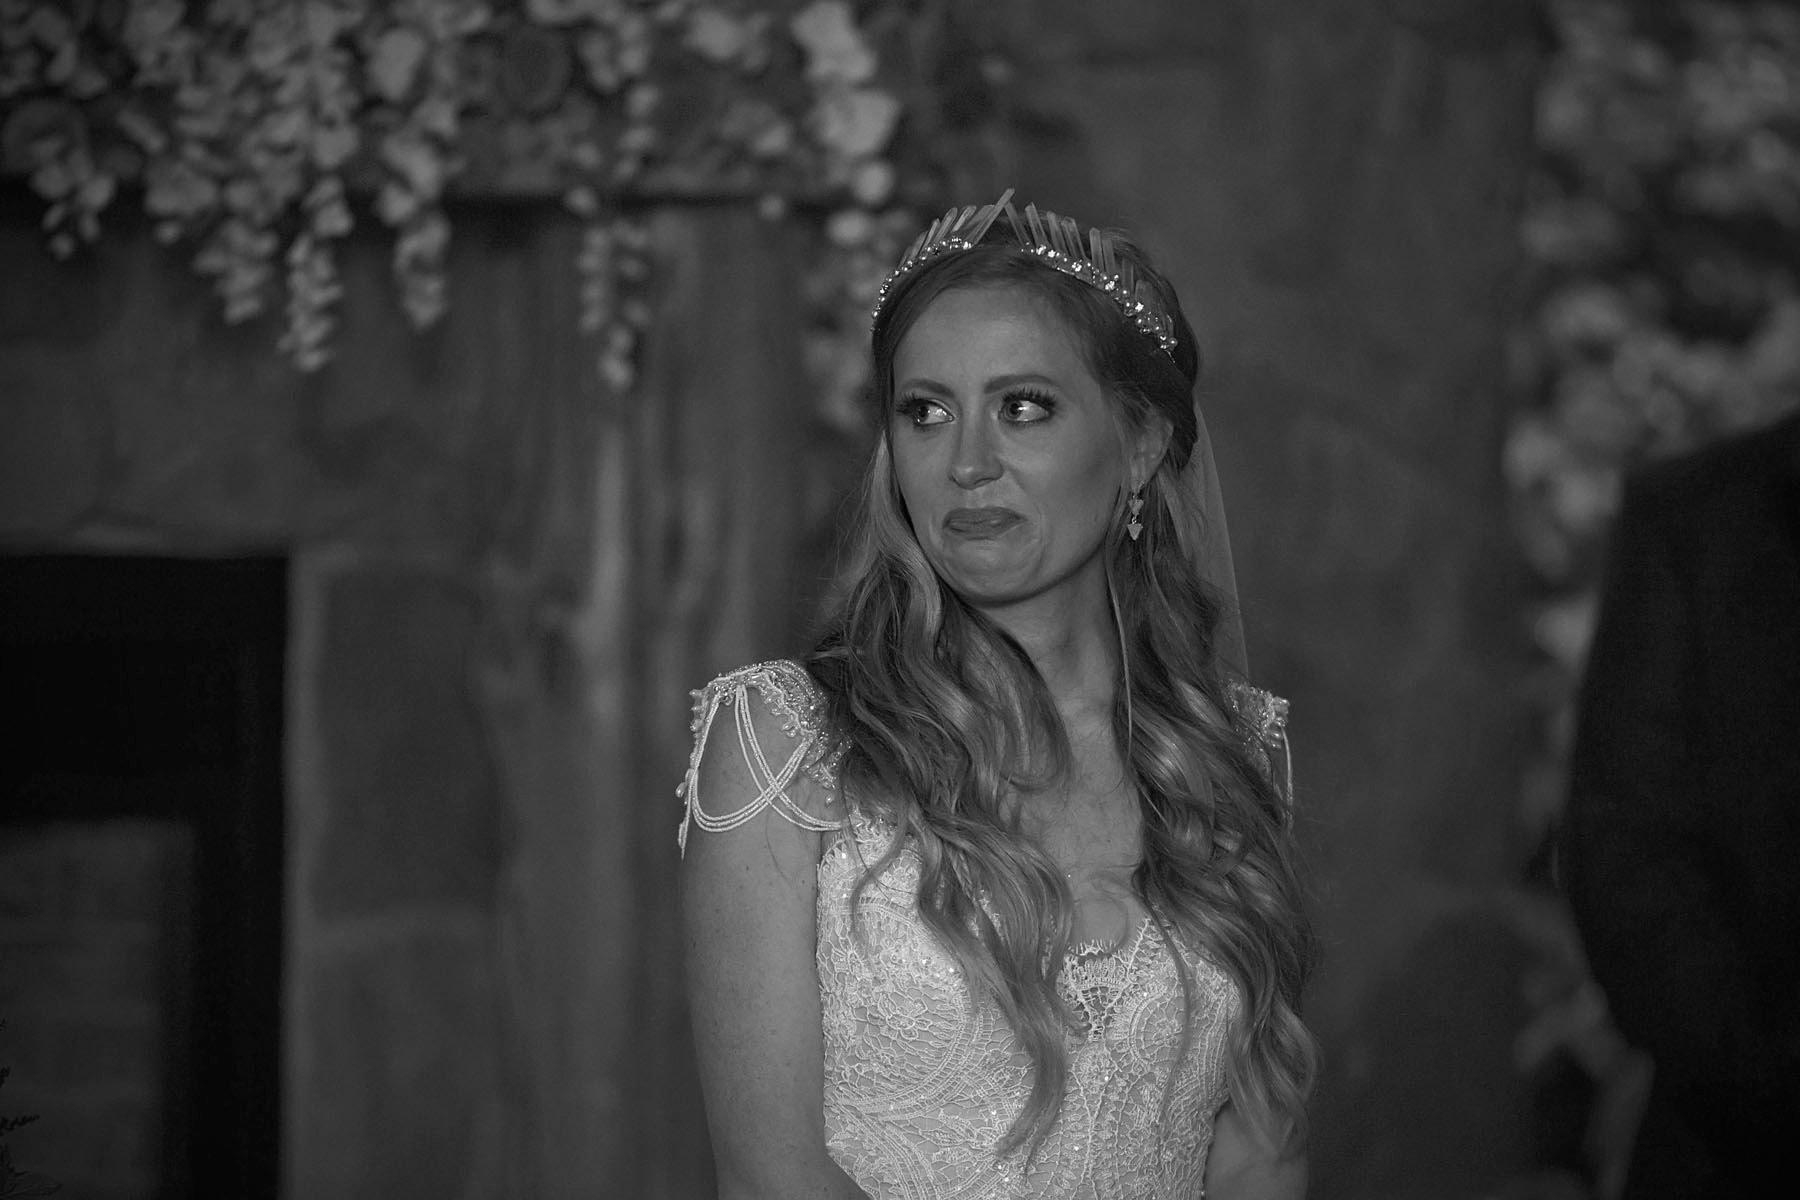 Bucks_County_wedding_photographer_Stroudsmoor_country_inn_wedding_Philadelphia_wedding_photographer_14_bride_tears_up.JPG